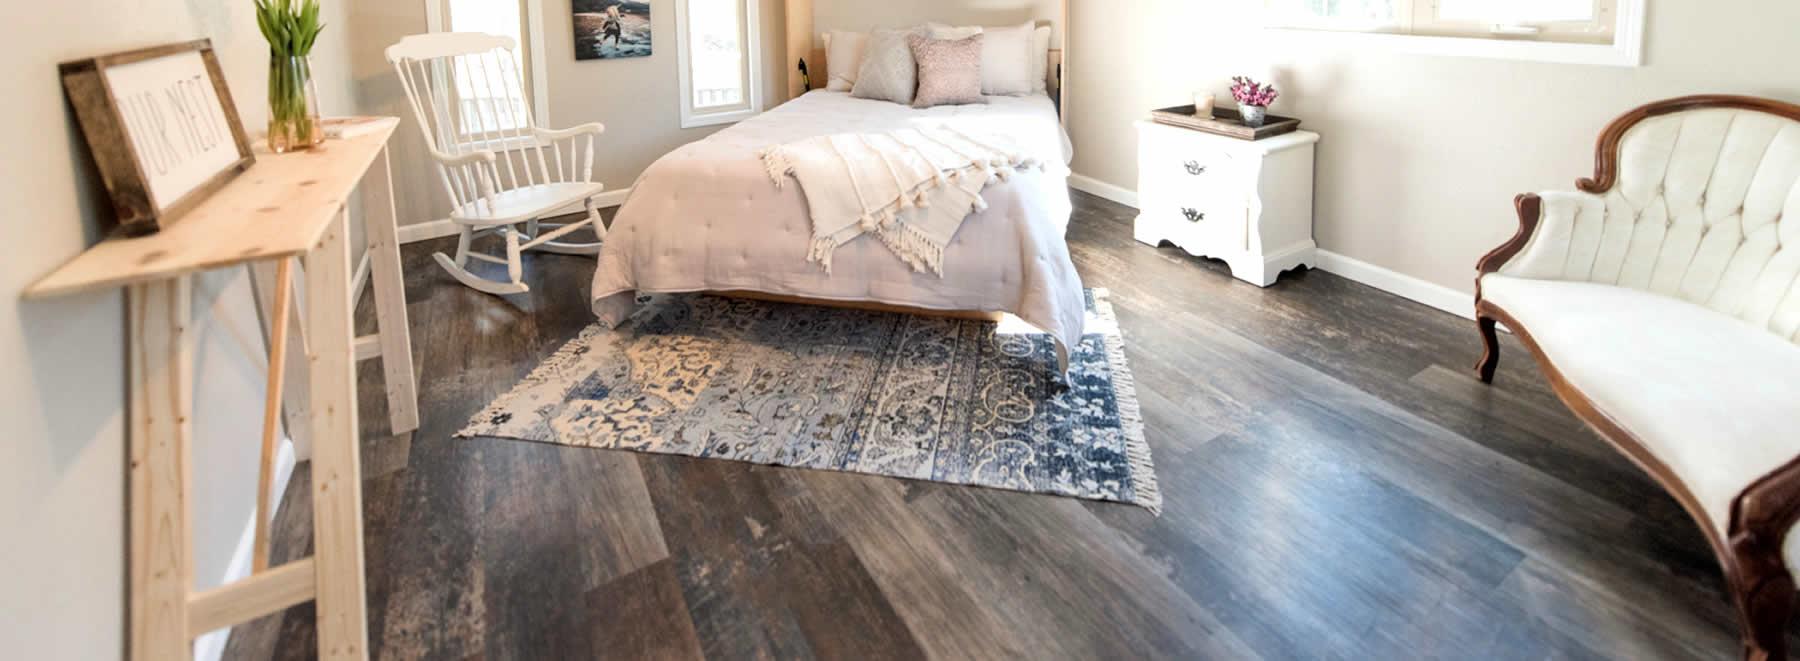 Purchase flooring from Ramsey Flooring